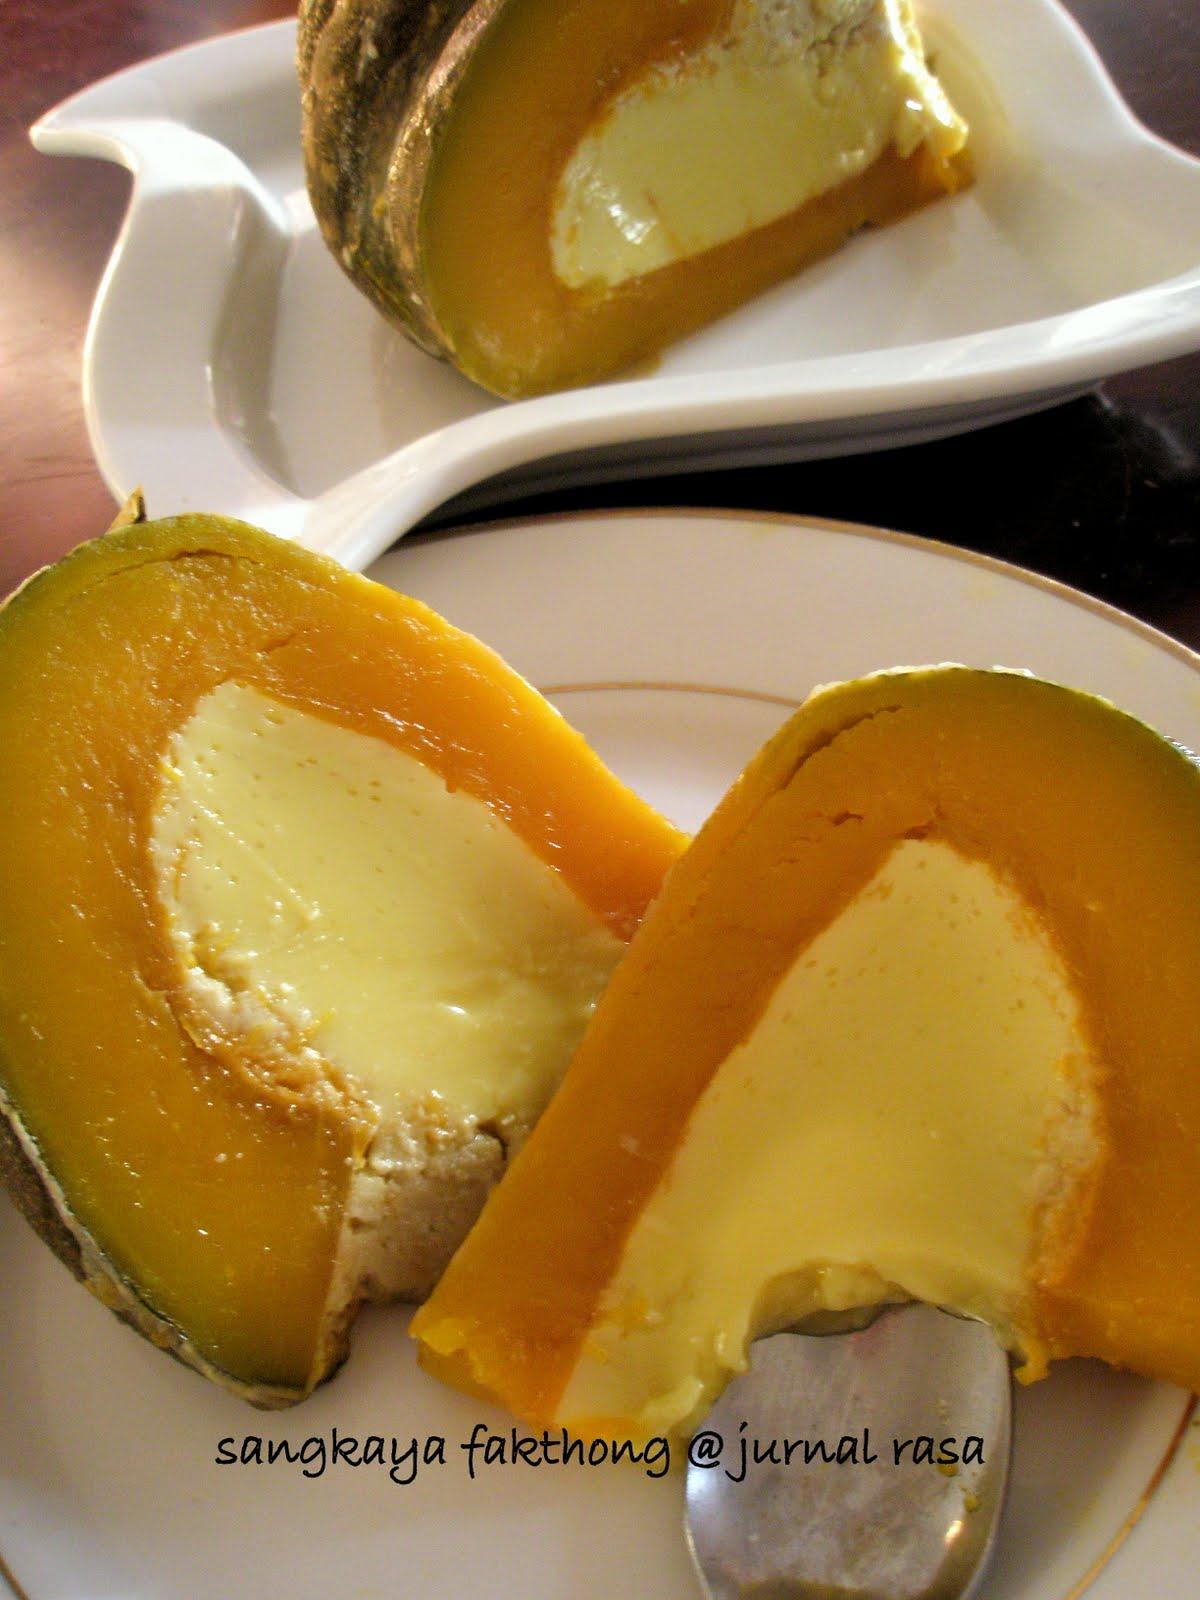 Resep Puding Labu Kuning : resep, puding, kuning, Resepi, Puding, Kuning, Hirup